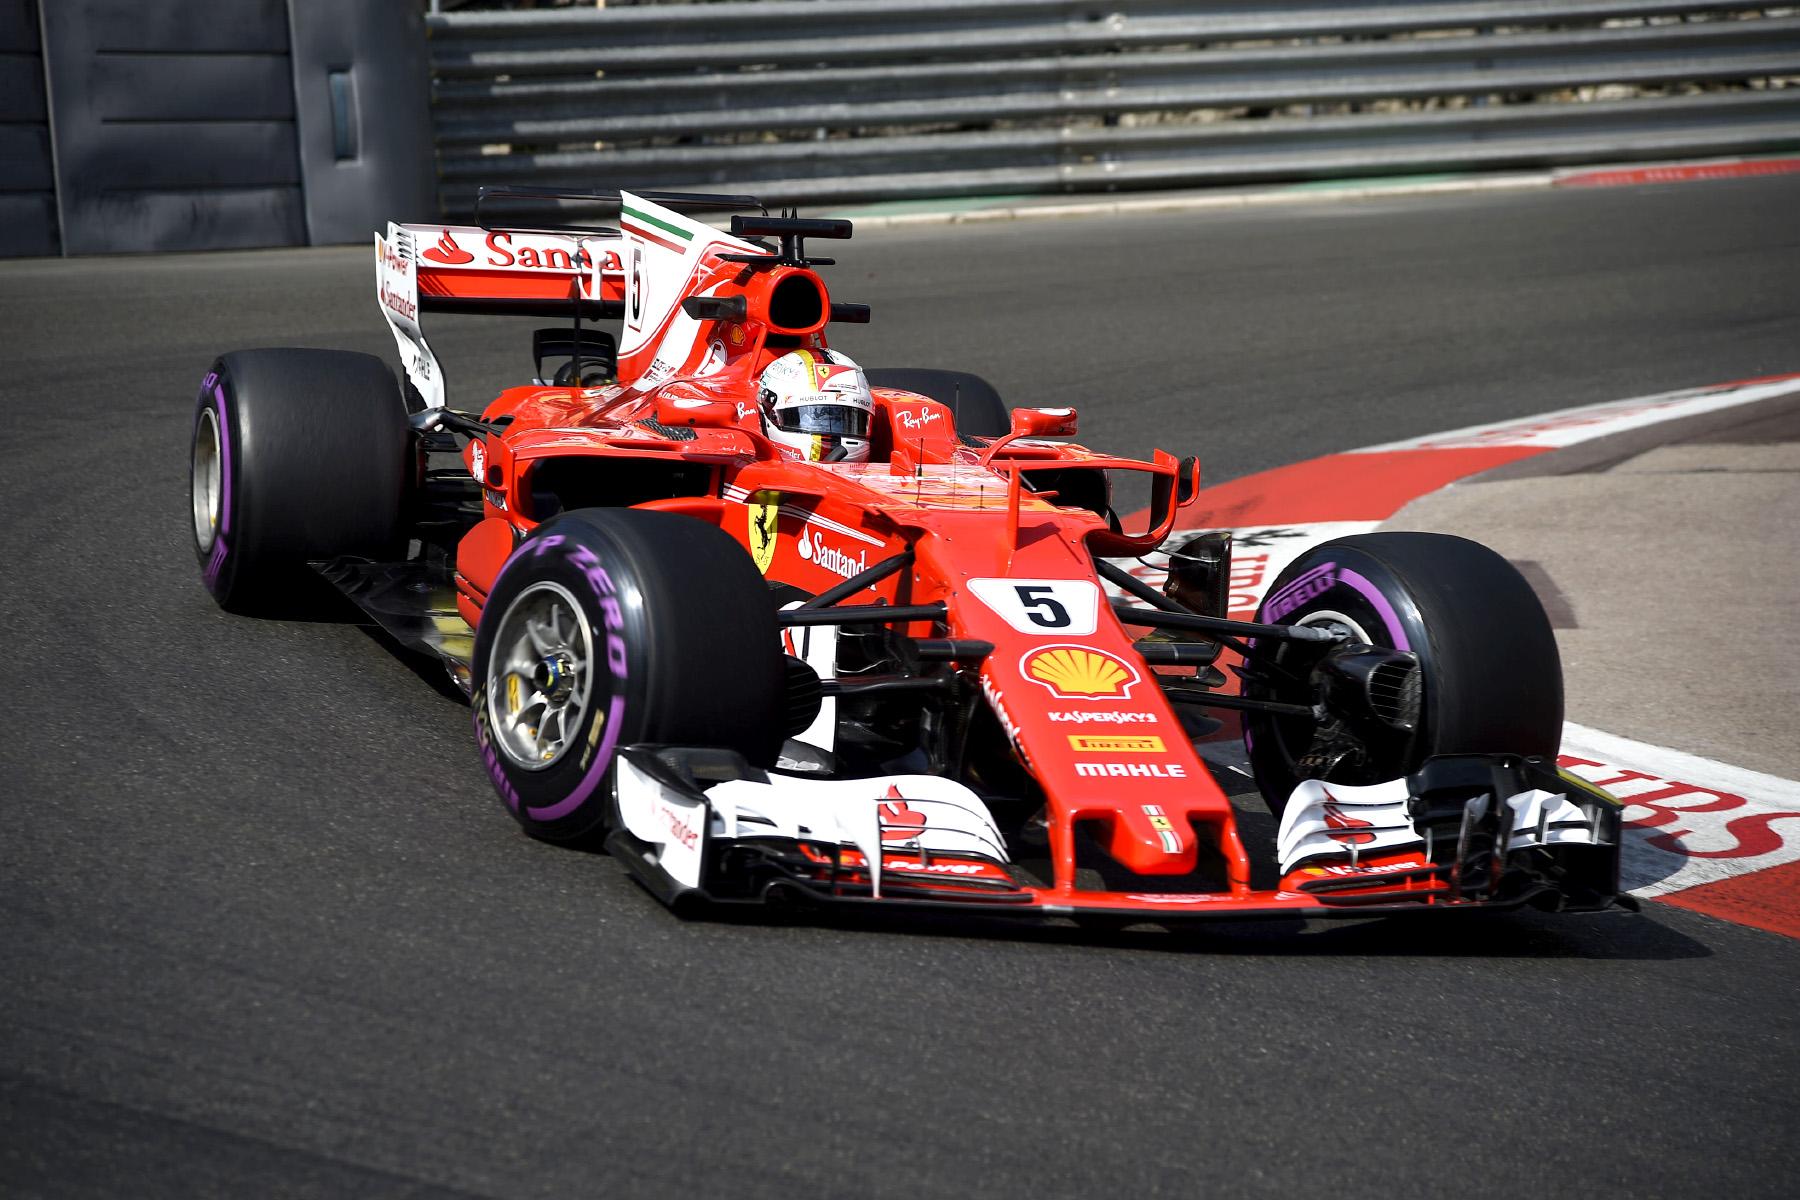 Sebastian Vettel in his Ferrari on the streets of Monte Carlo